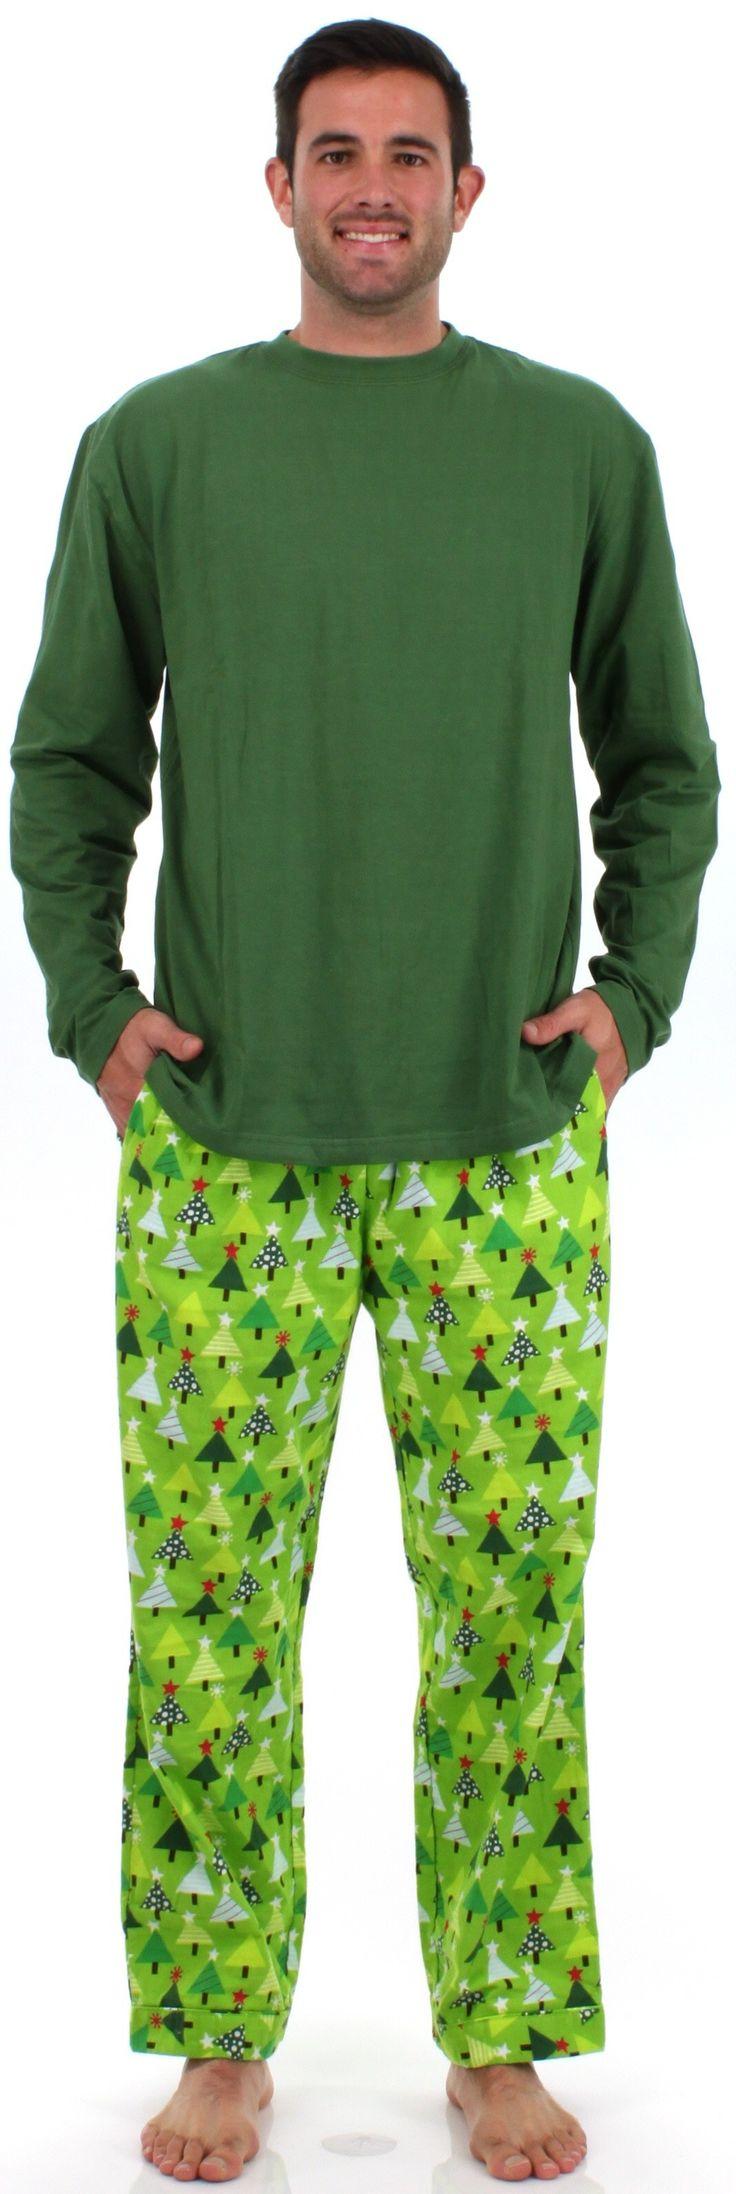 22 best Winter Pajamas images on Pinterest